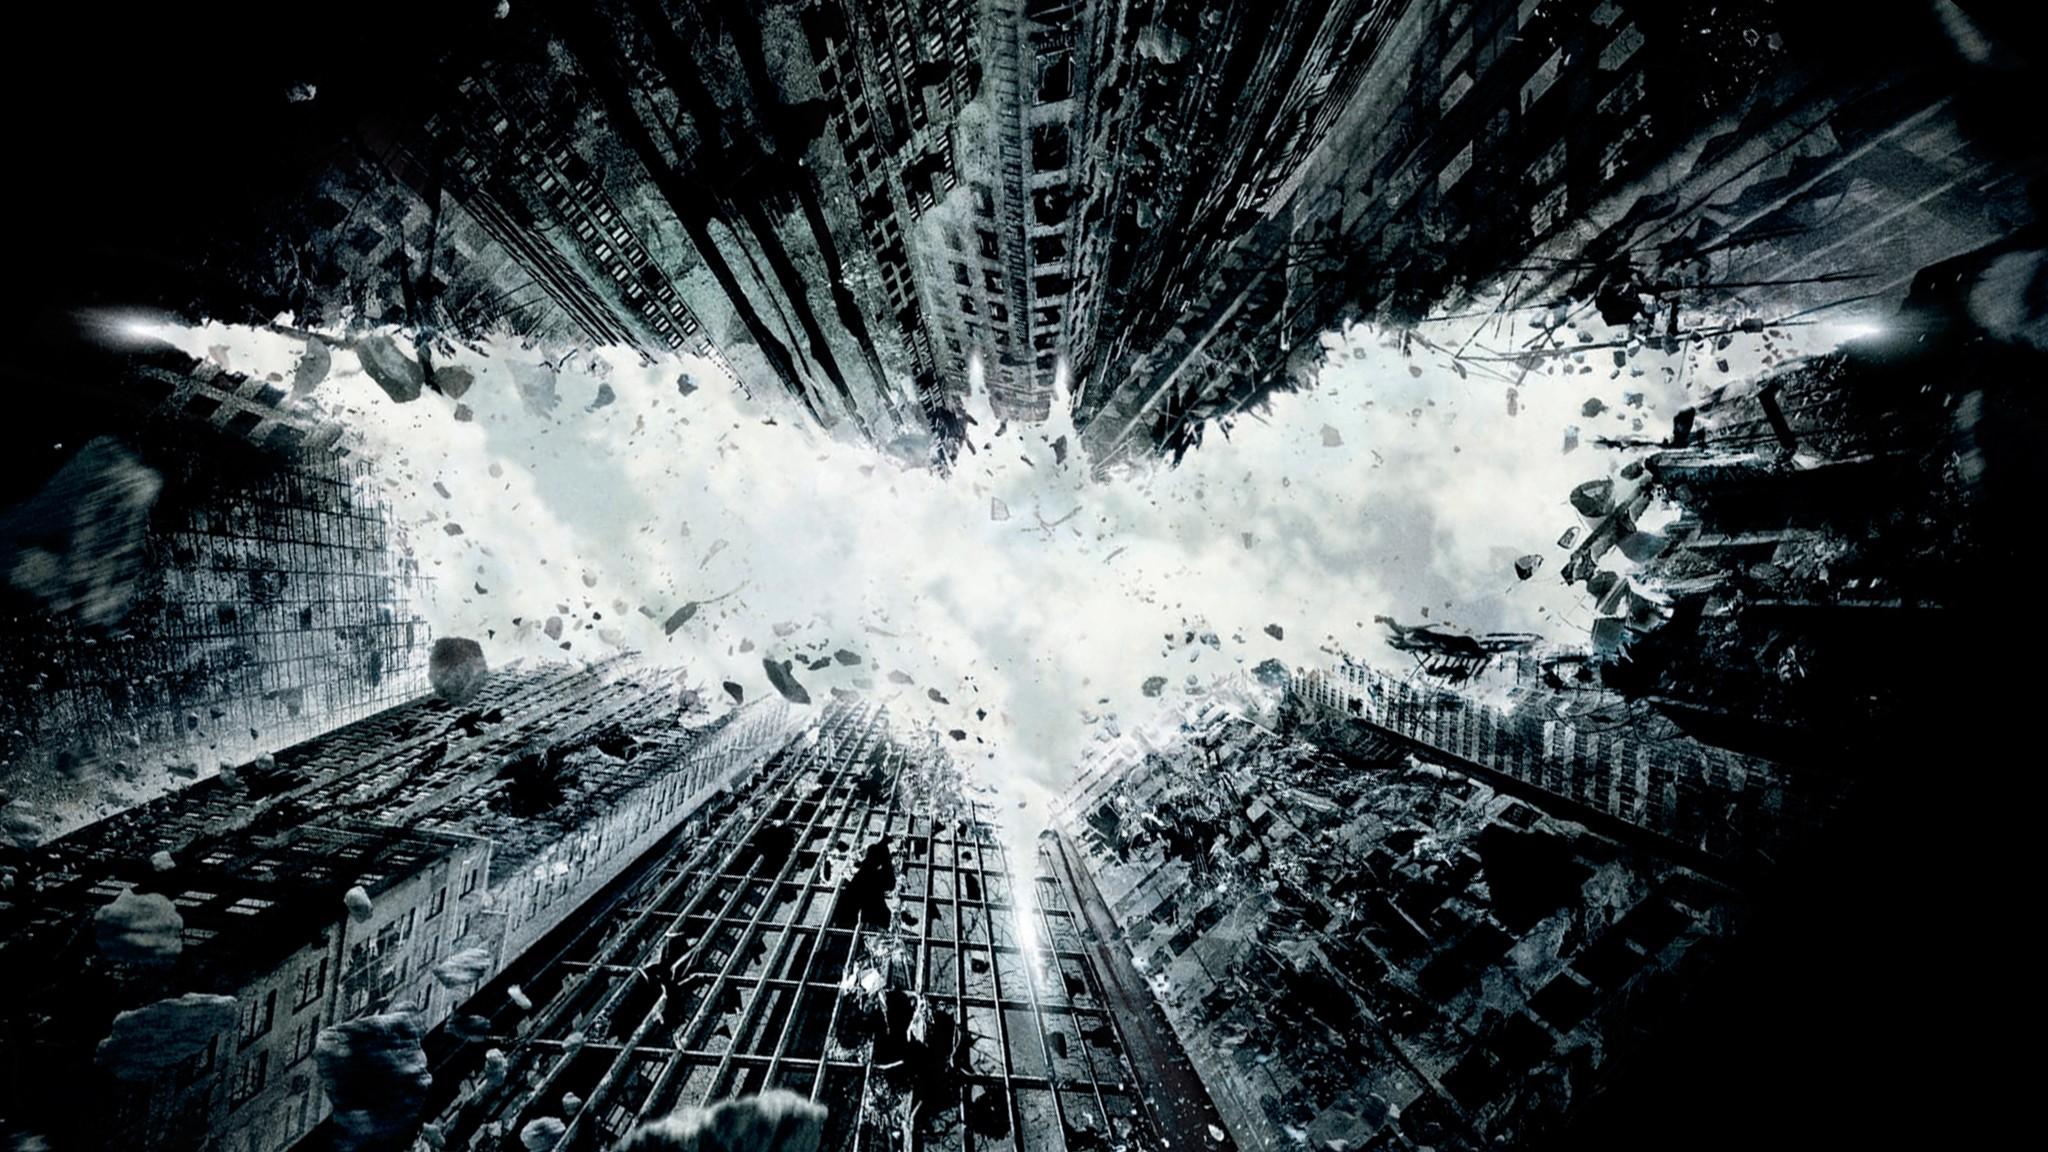 Batman wallpaper HD ·① Download free High Resolution ...